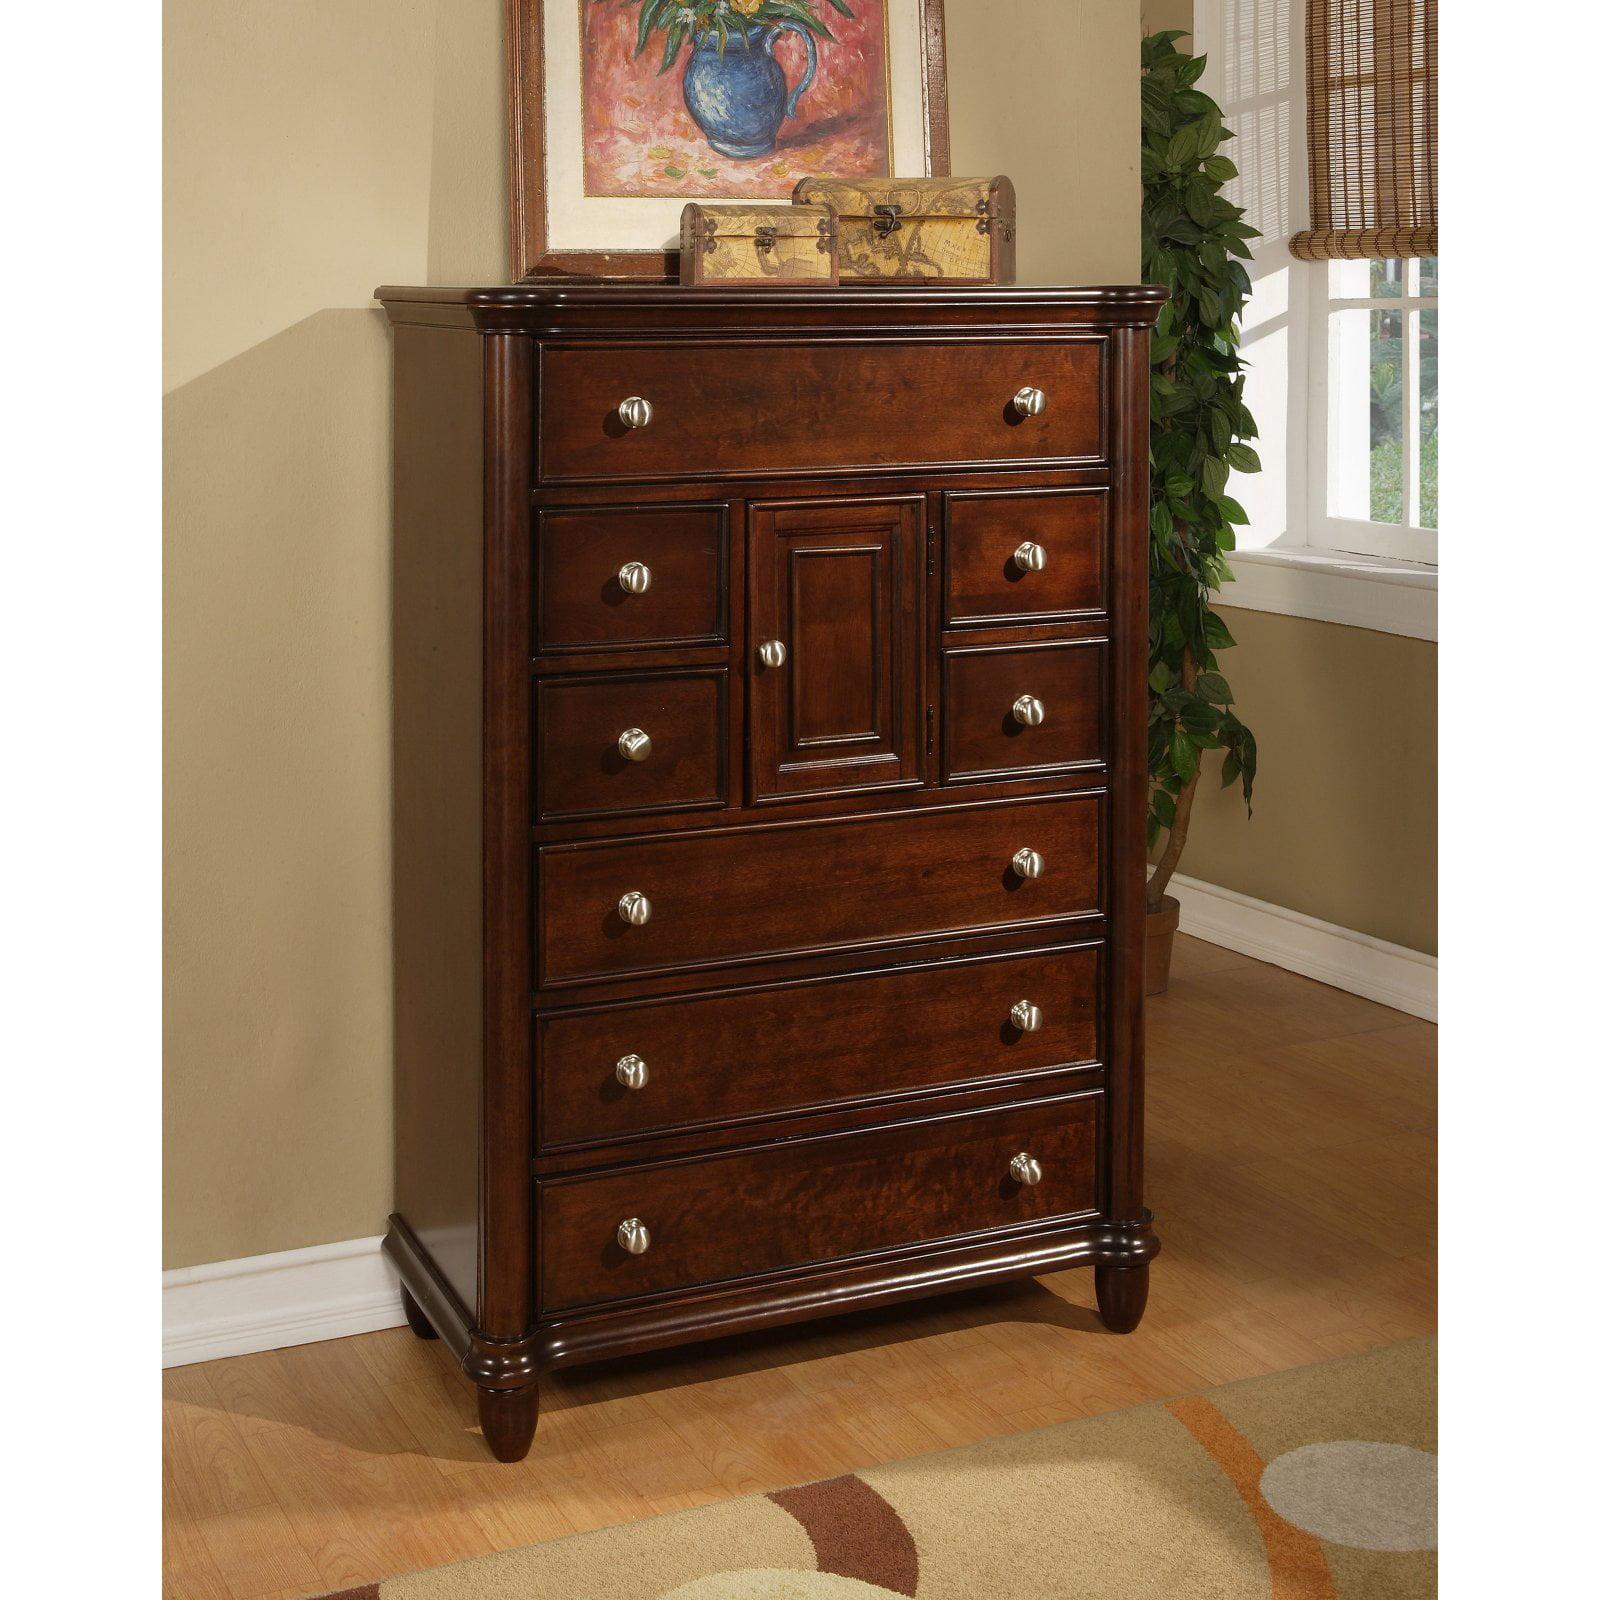 Picket House Furnishings Hamilton 8 Drawer 1-Door Chest - Warm Brown Cherry